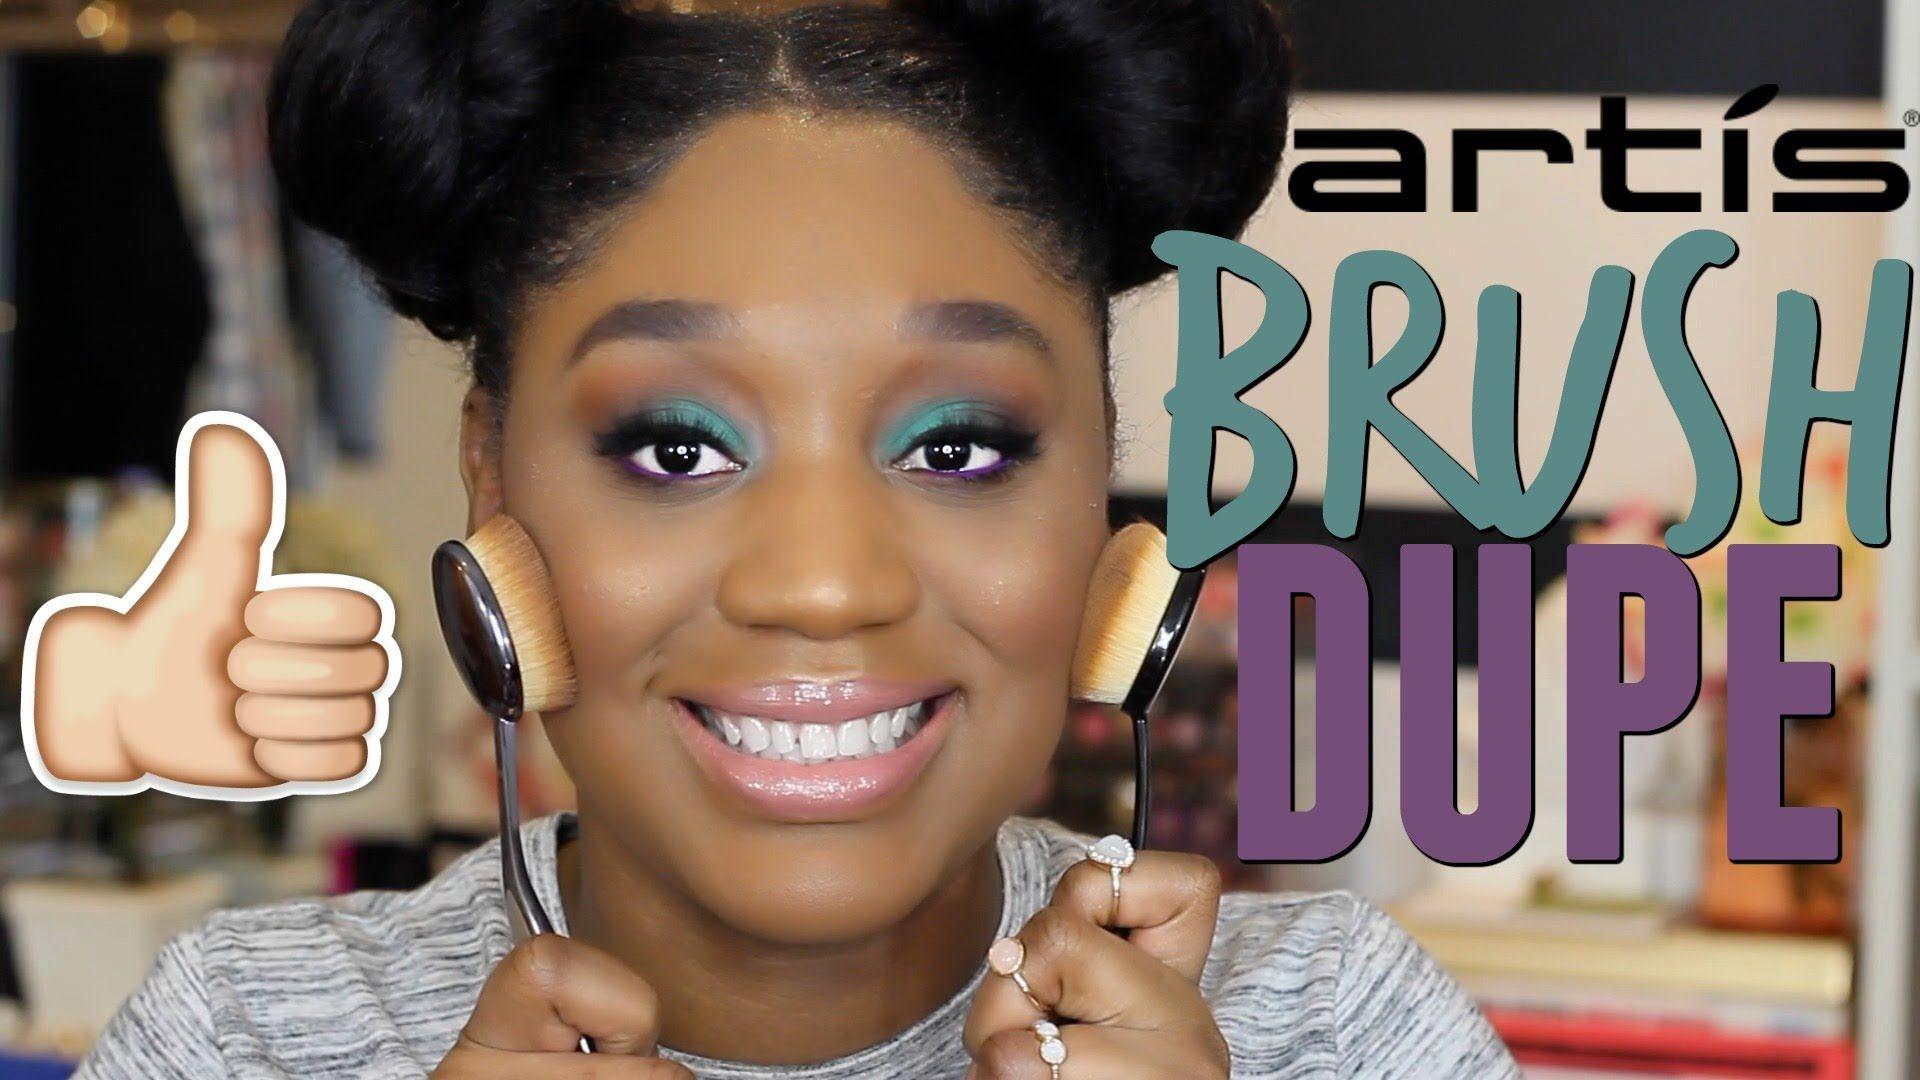 Artis Brush Dupe? Demo YouTube Artis brushes, Dupes